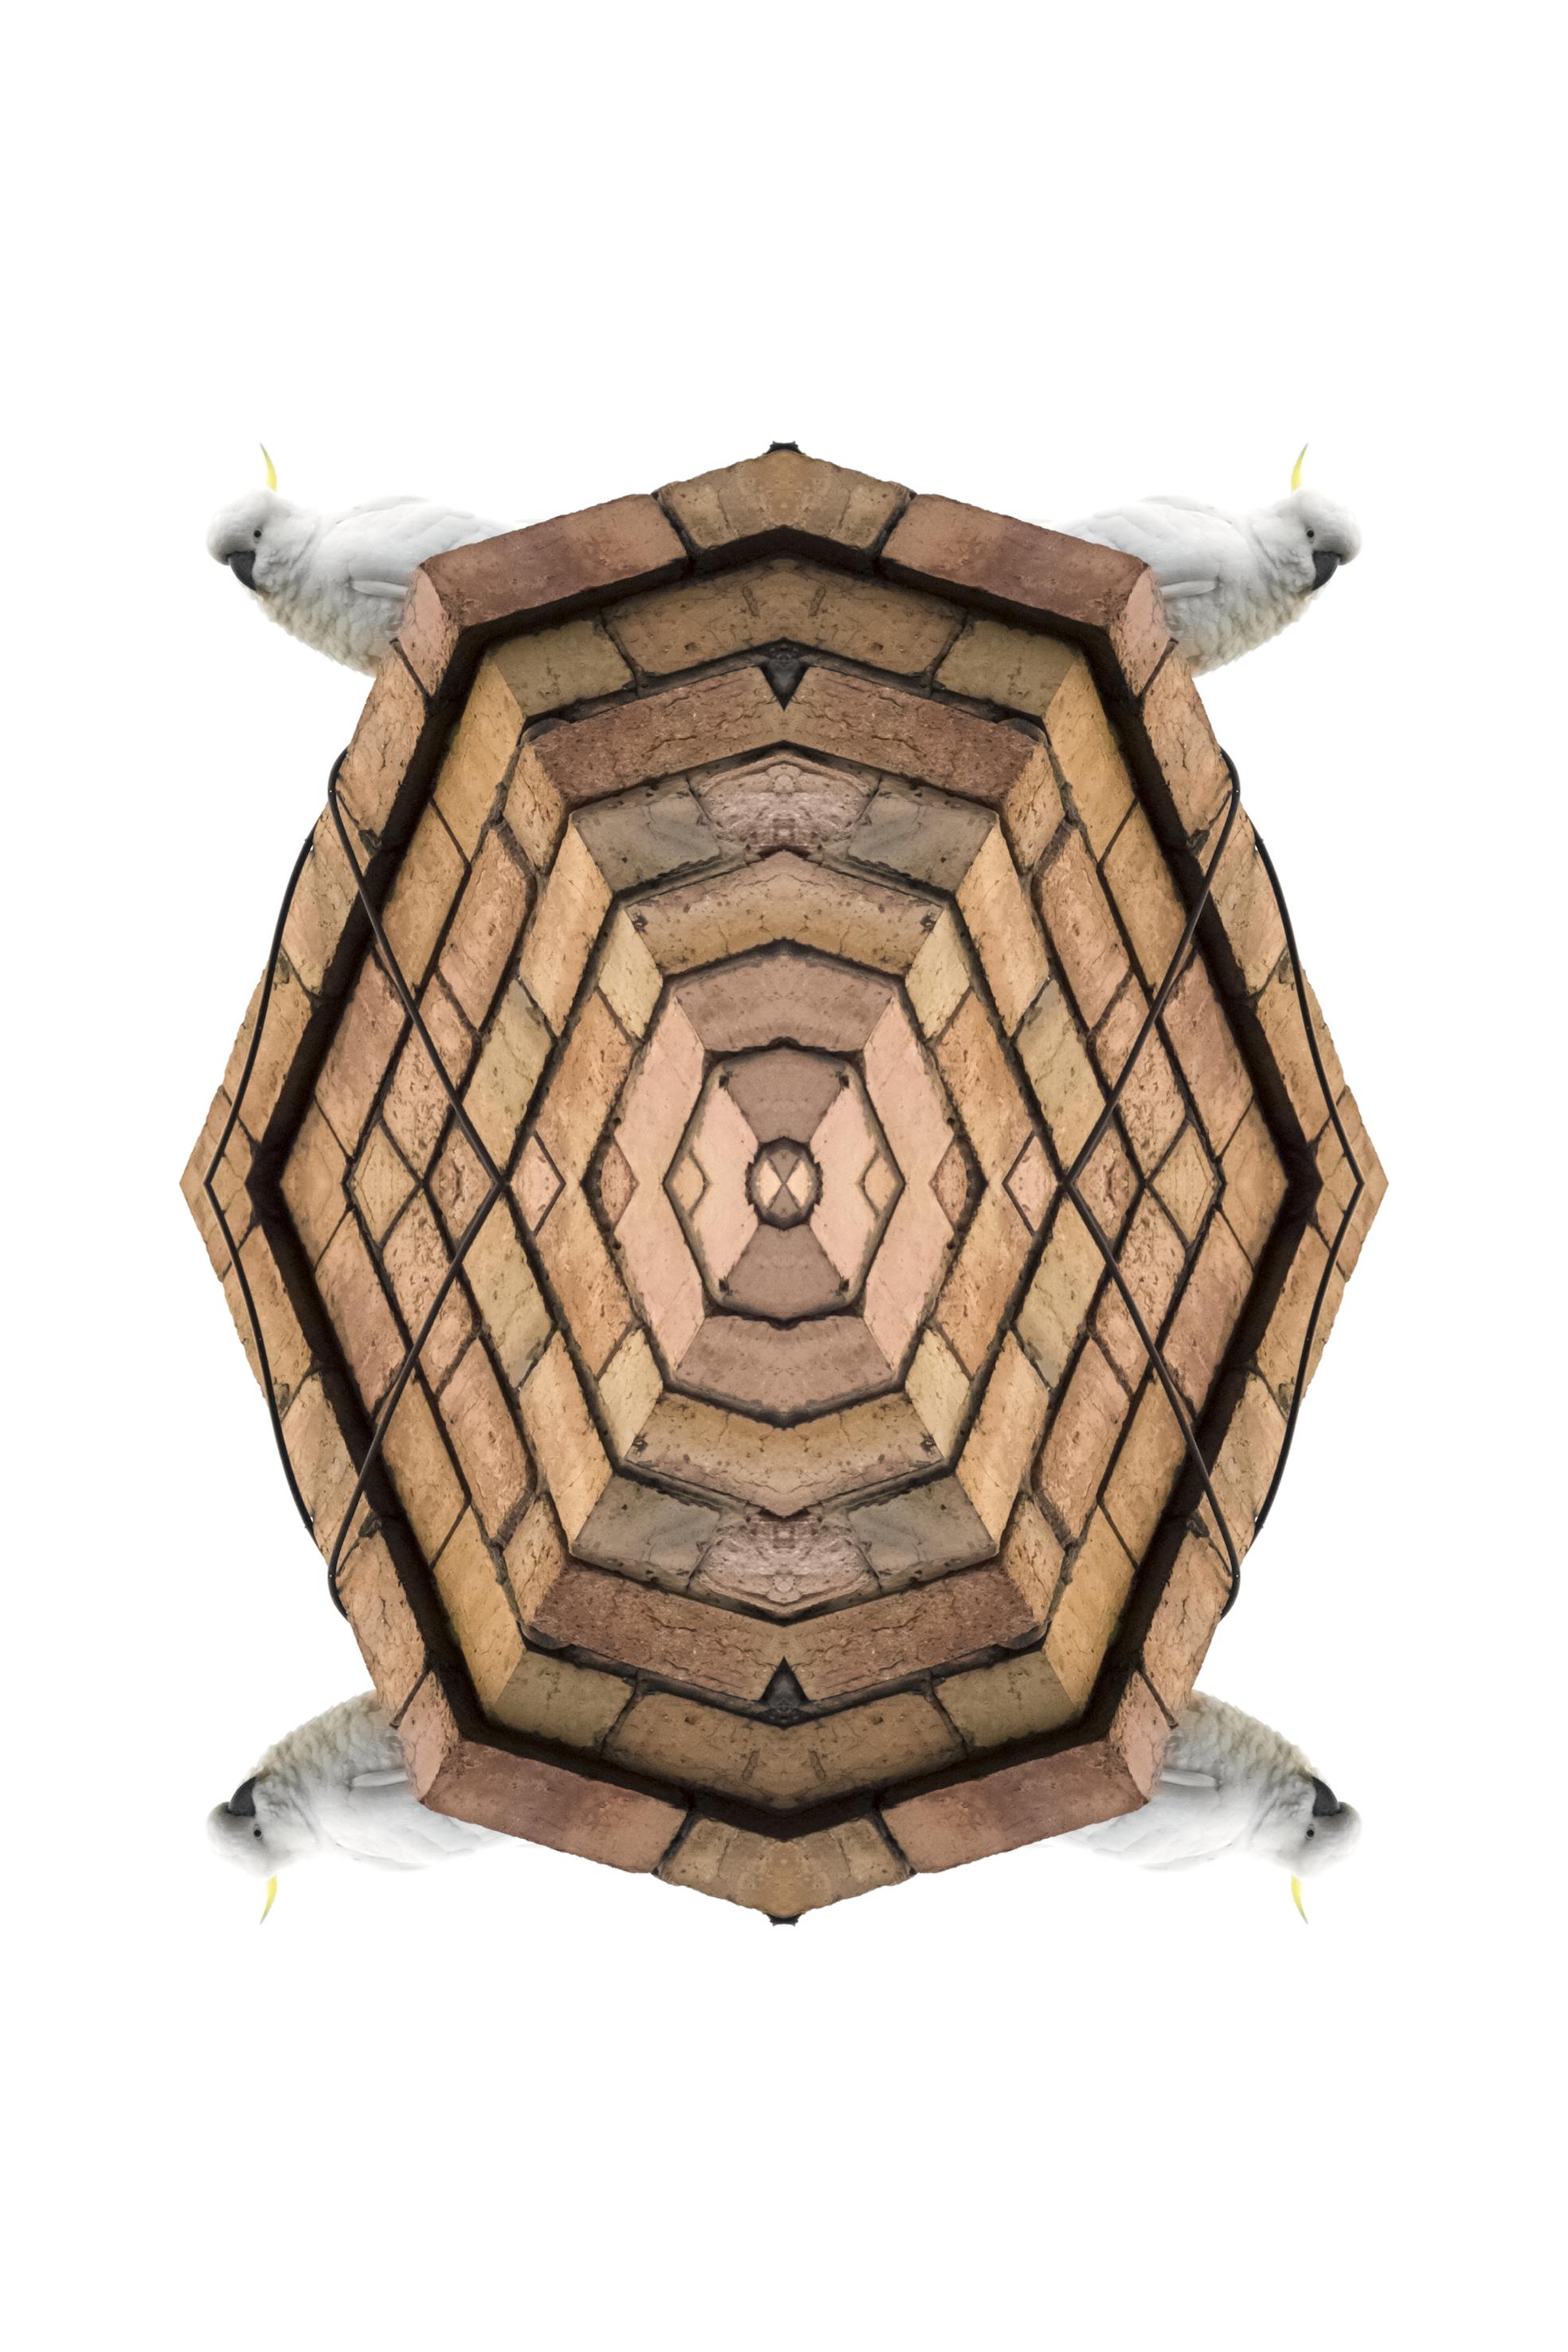 Sulphur-Crested Cockatoo,  2017  Archival print on cotton rag paper  150 x 100 cm